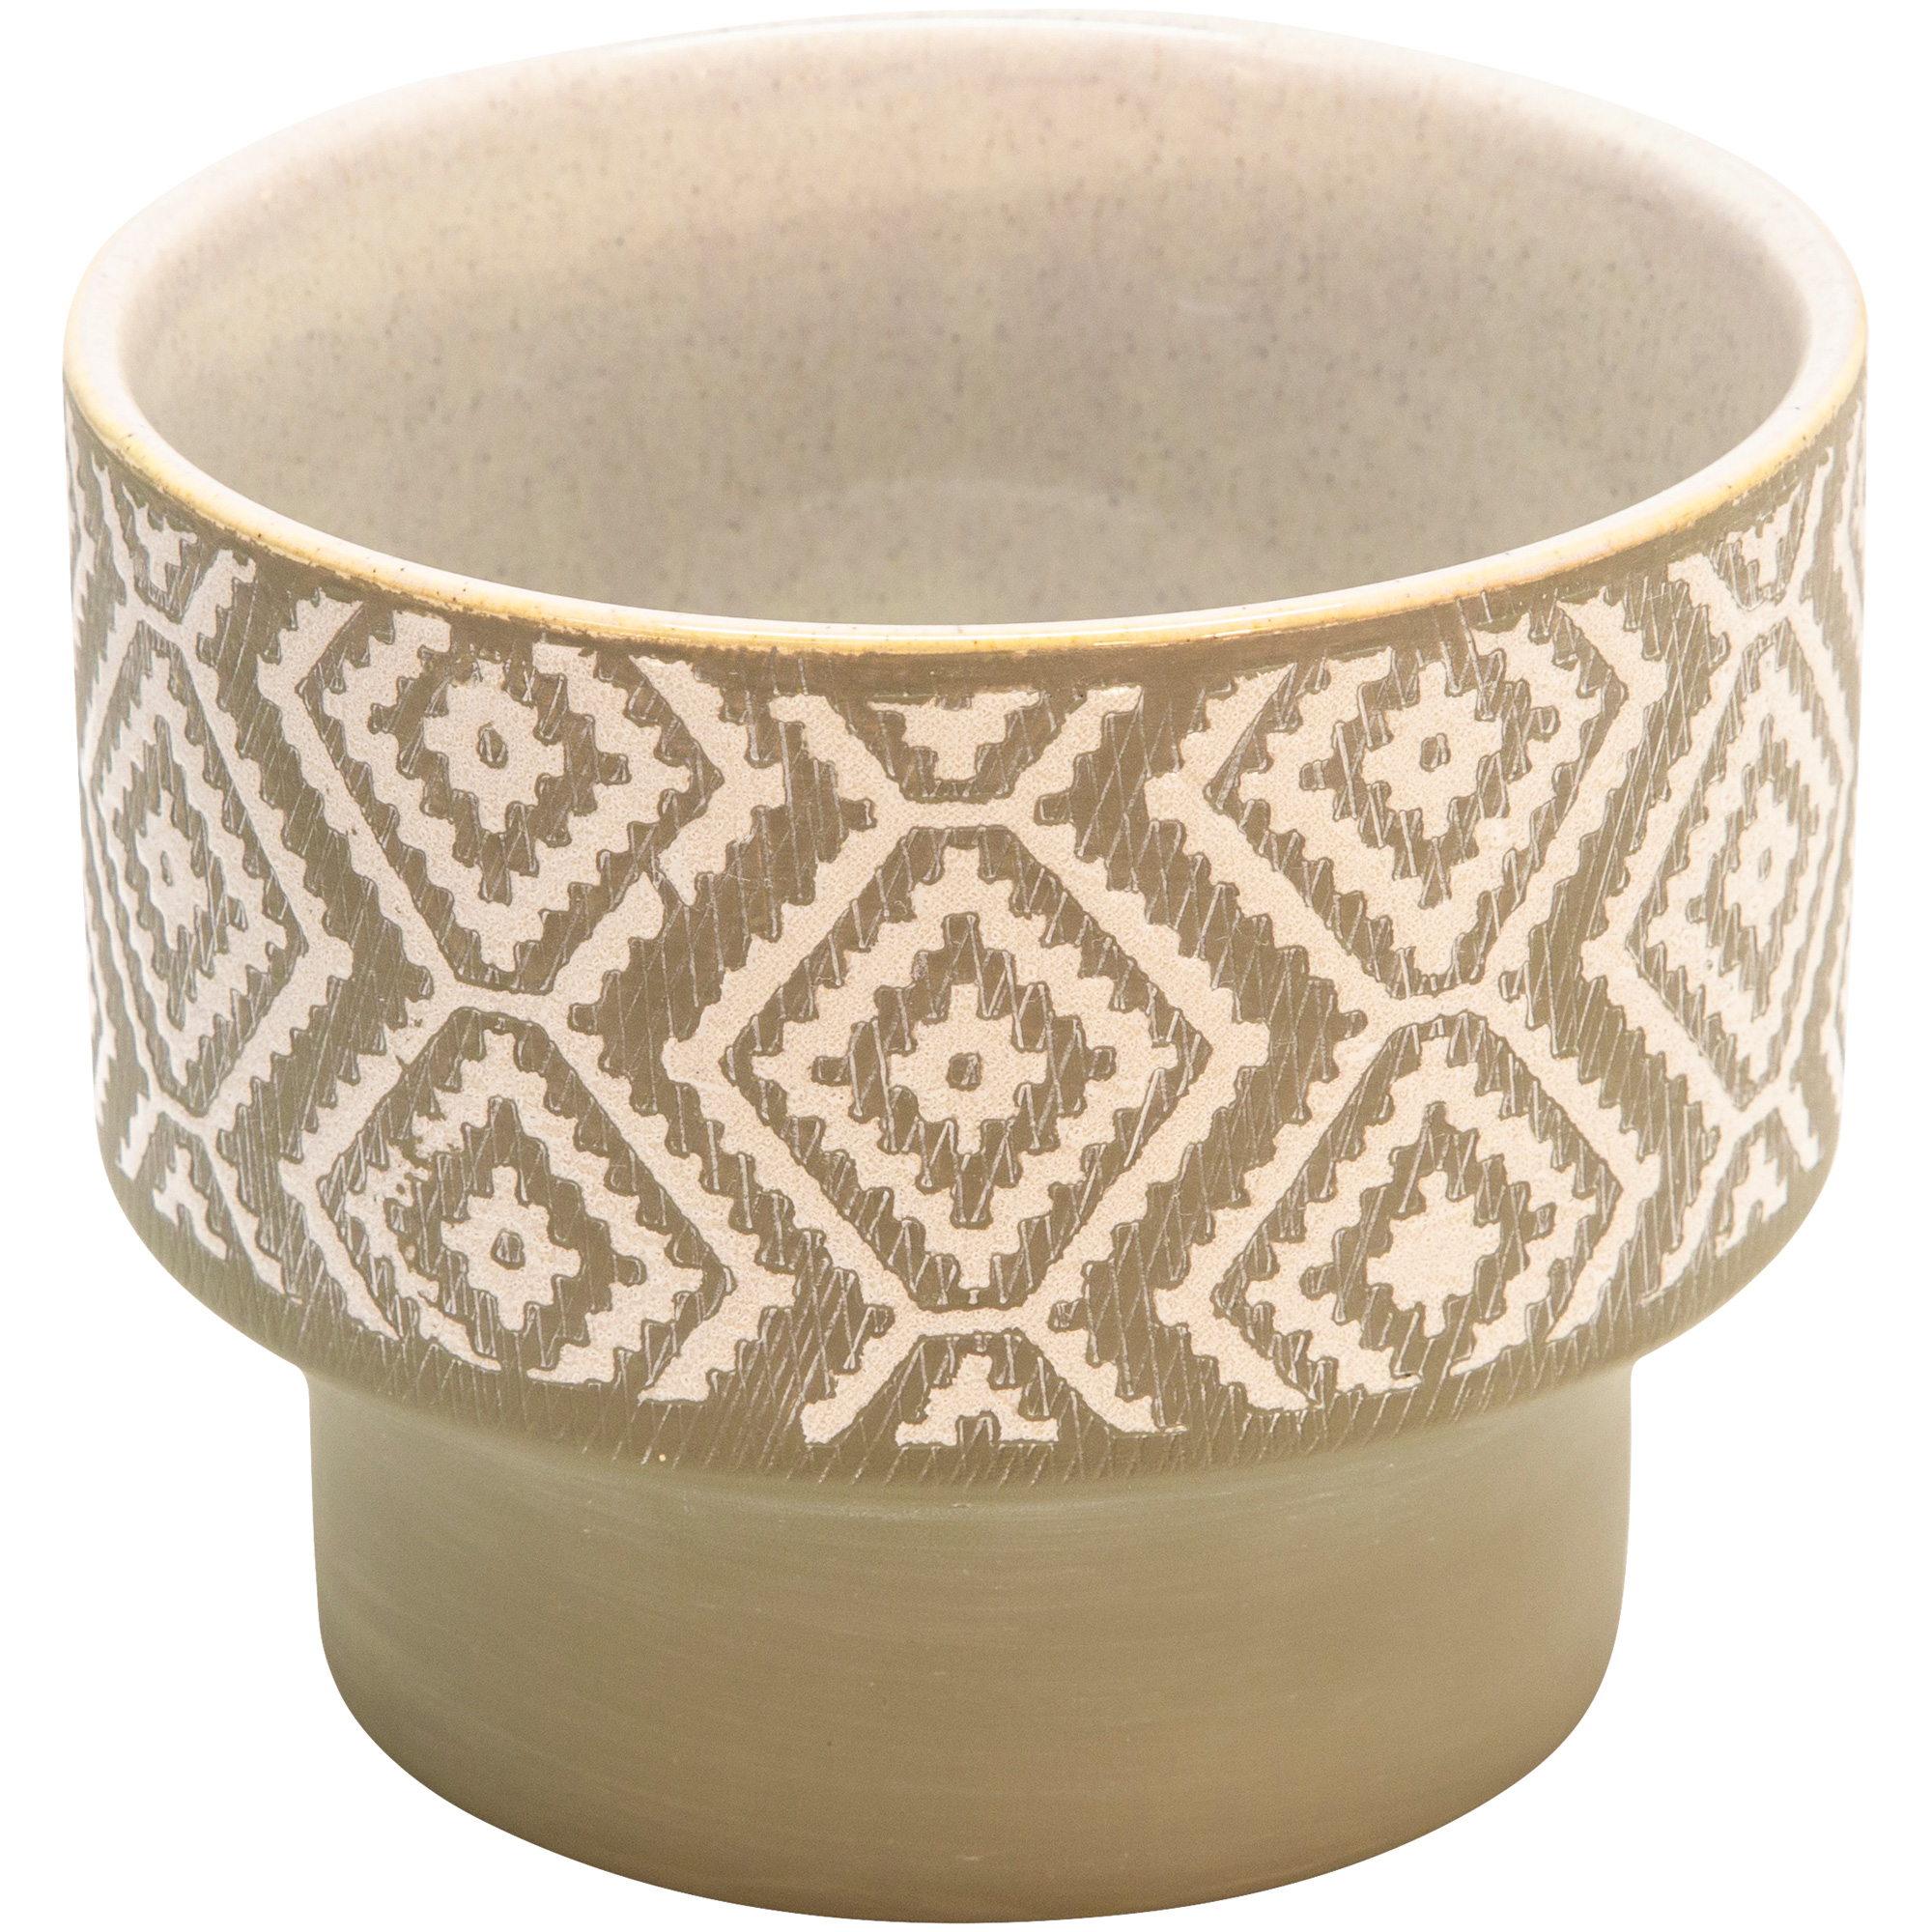 Sagebrook | Collected Culture Beige Ceramic Planter